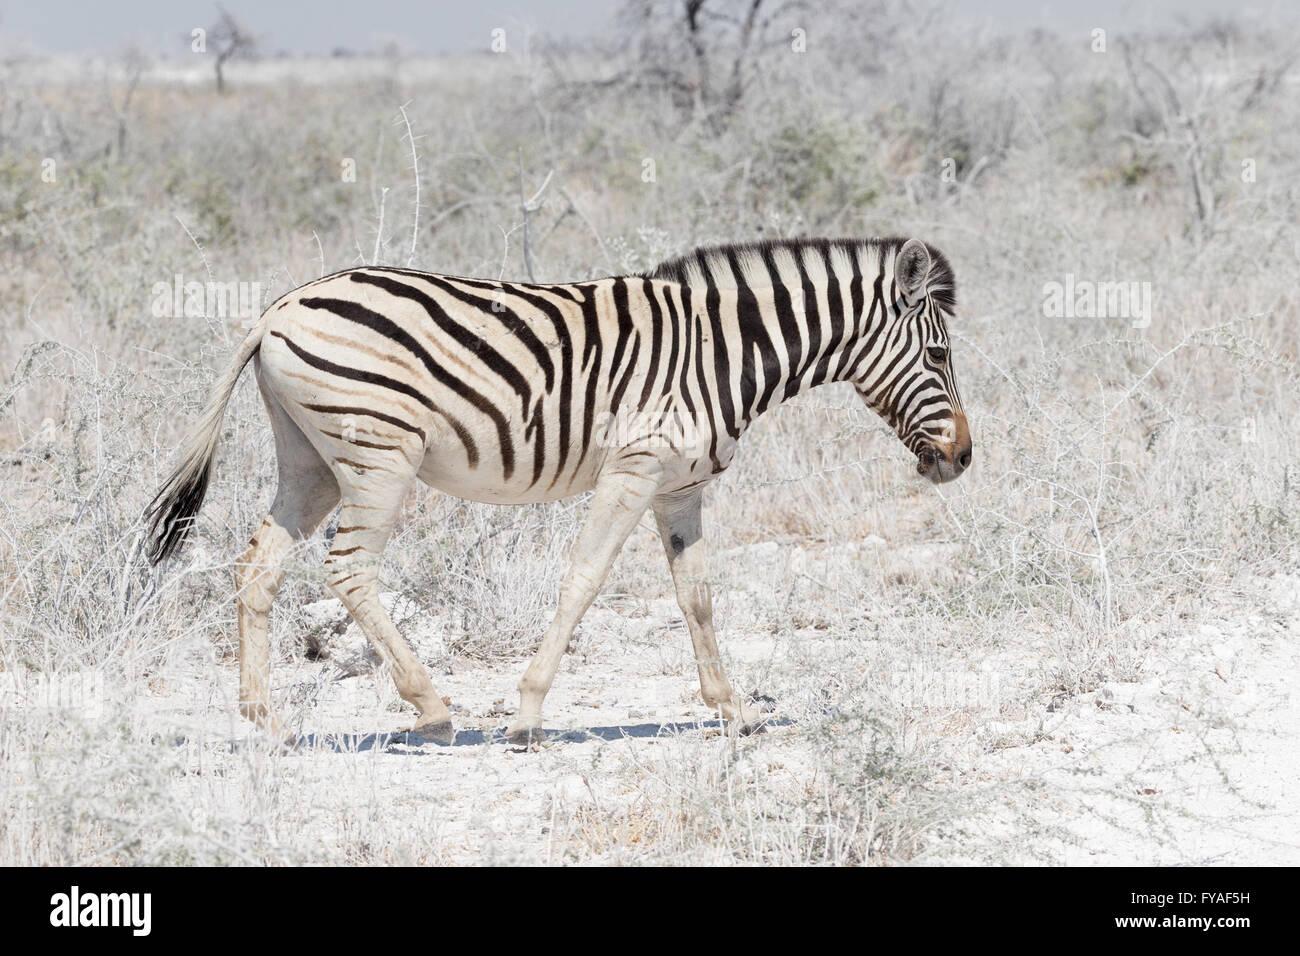 Plain's Zebra Chapman's race Etosha National Park Namibia - Stock Image